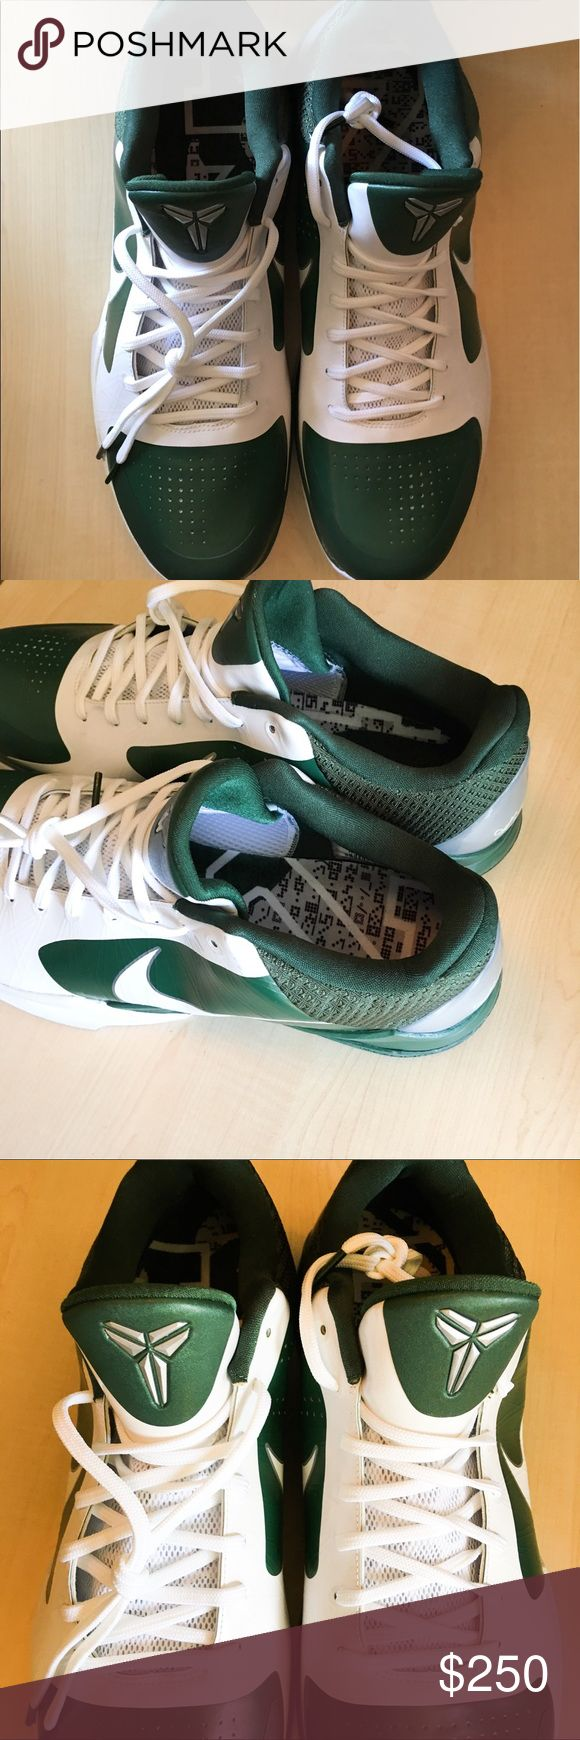 Nike Zoom Kobe Basketball Shoes Nike Zoom Nike Shoes Sneakers